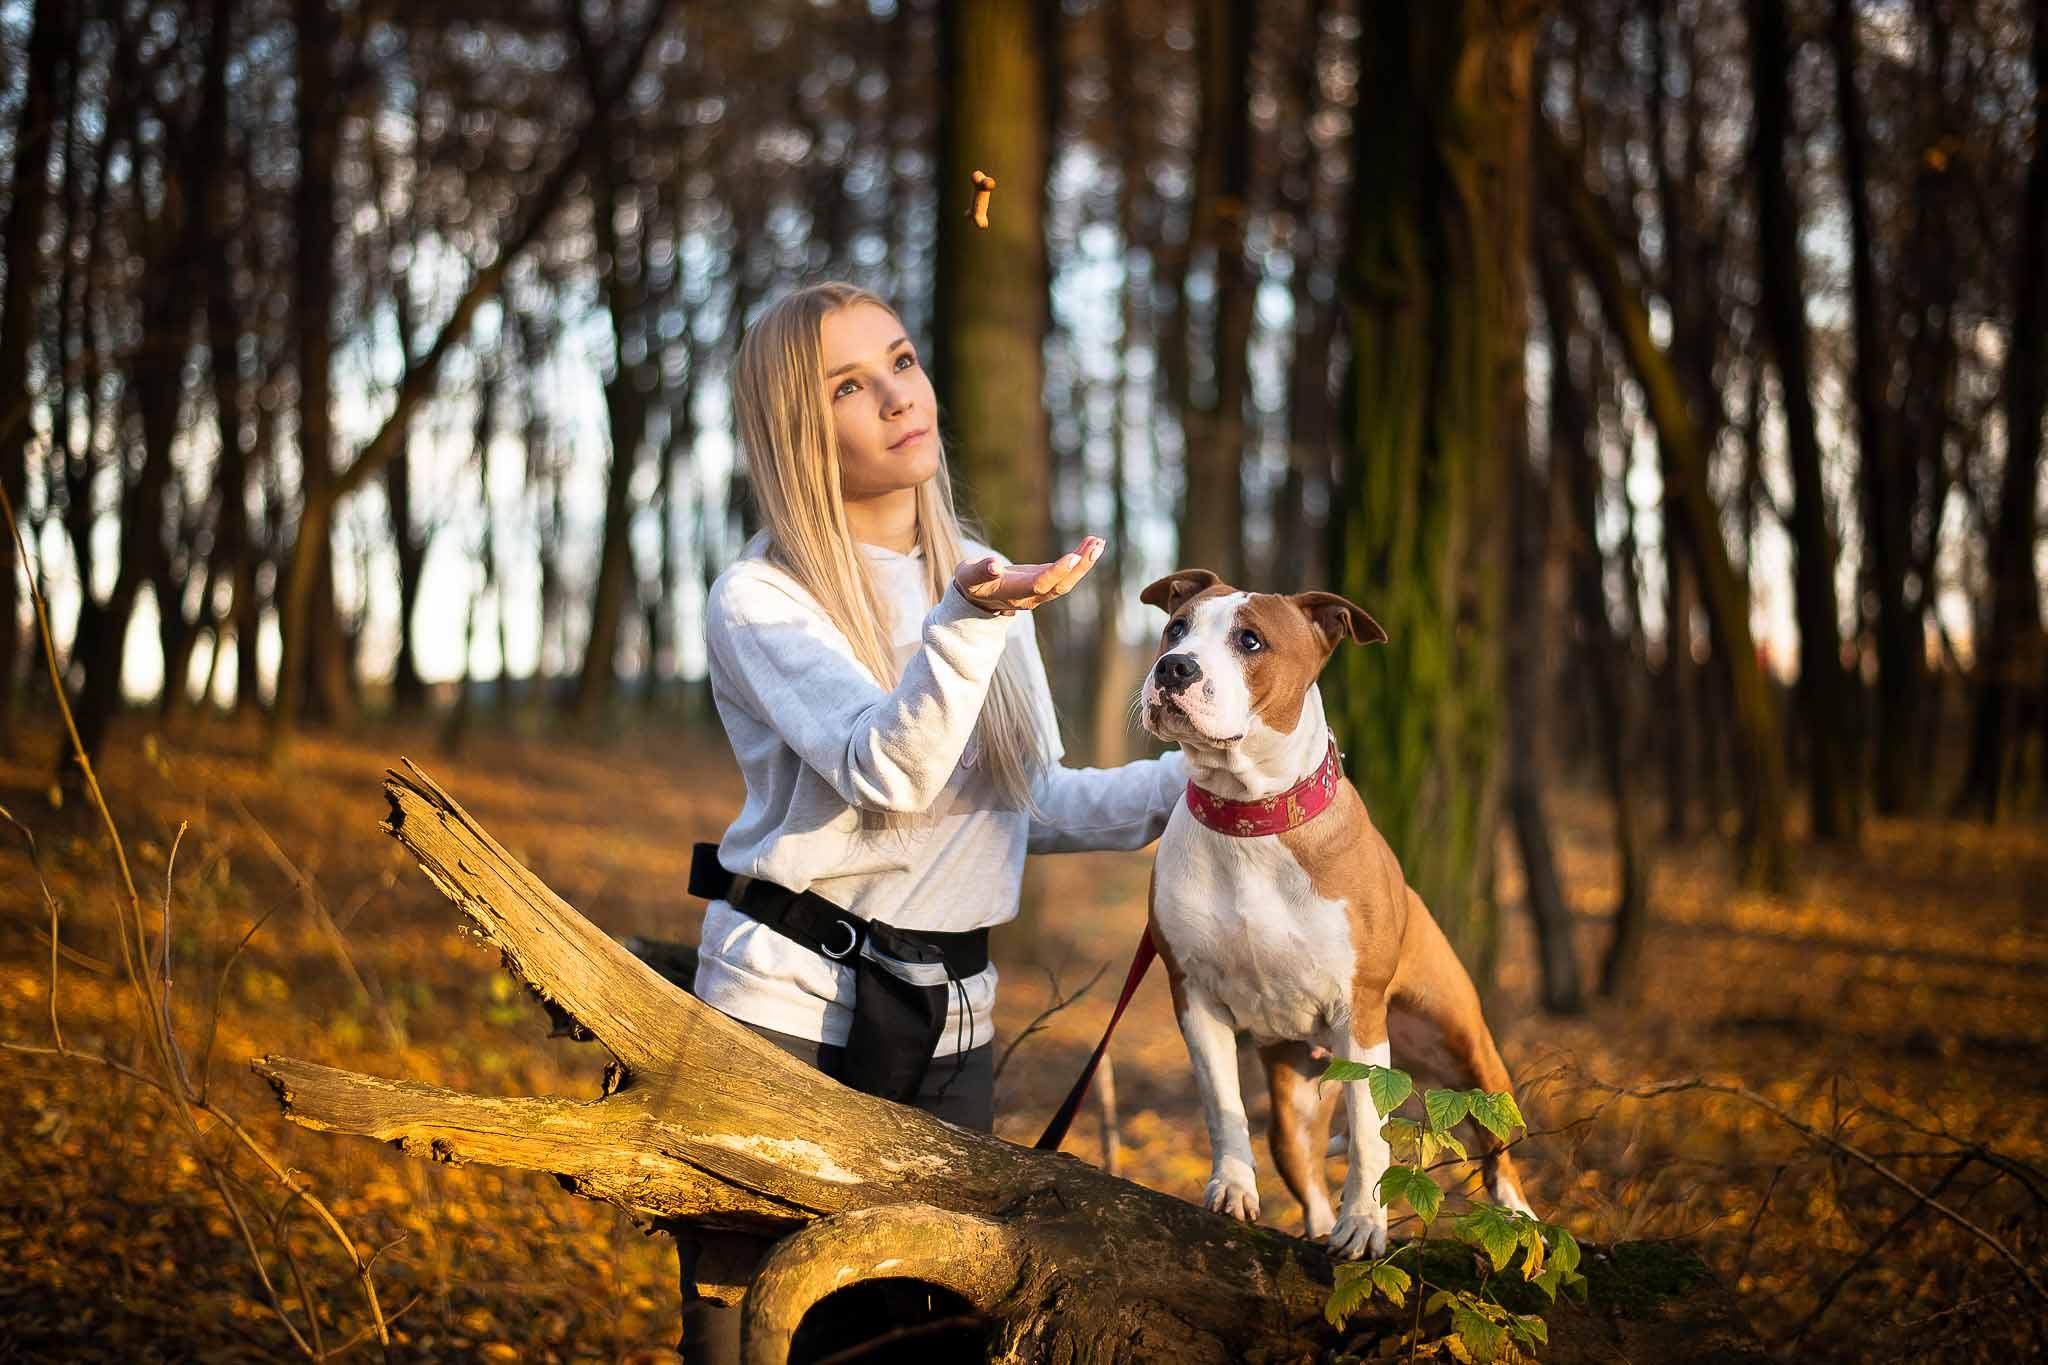 Hodowla Amstaffów - Amstaffy.pl - Hodowla psów rasowych - Amstaff